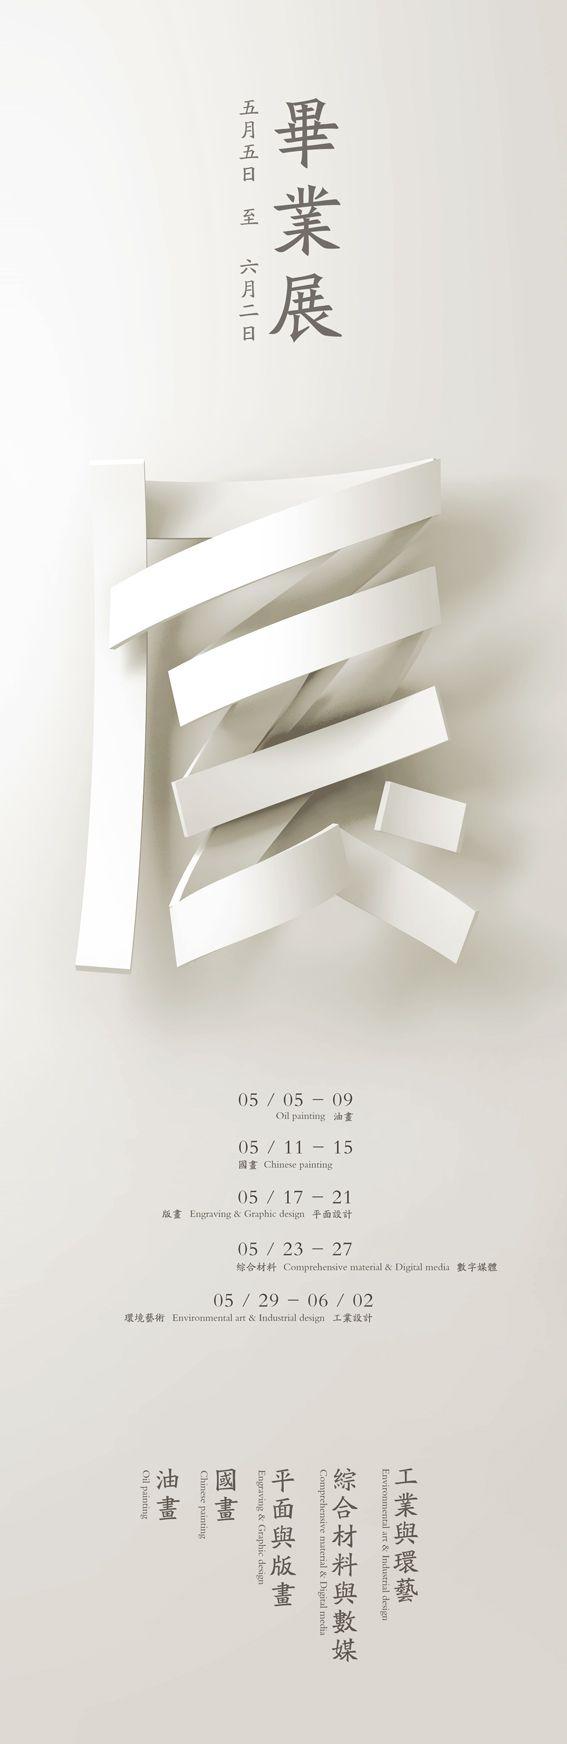 Yao Yuan love graphic design Guangzhou / graphic designer South China Normal University Graduation Exhibition Poster Design